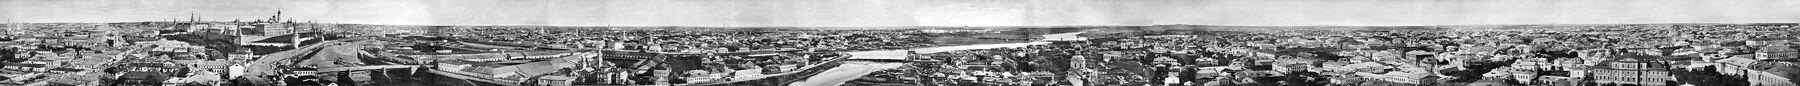 1867 Moscow panorama megapanorama